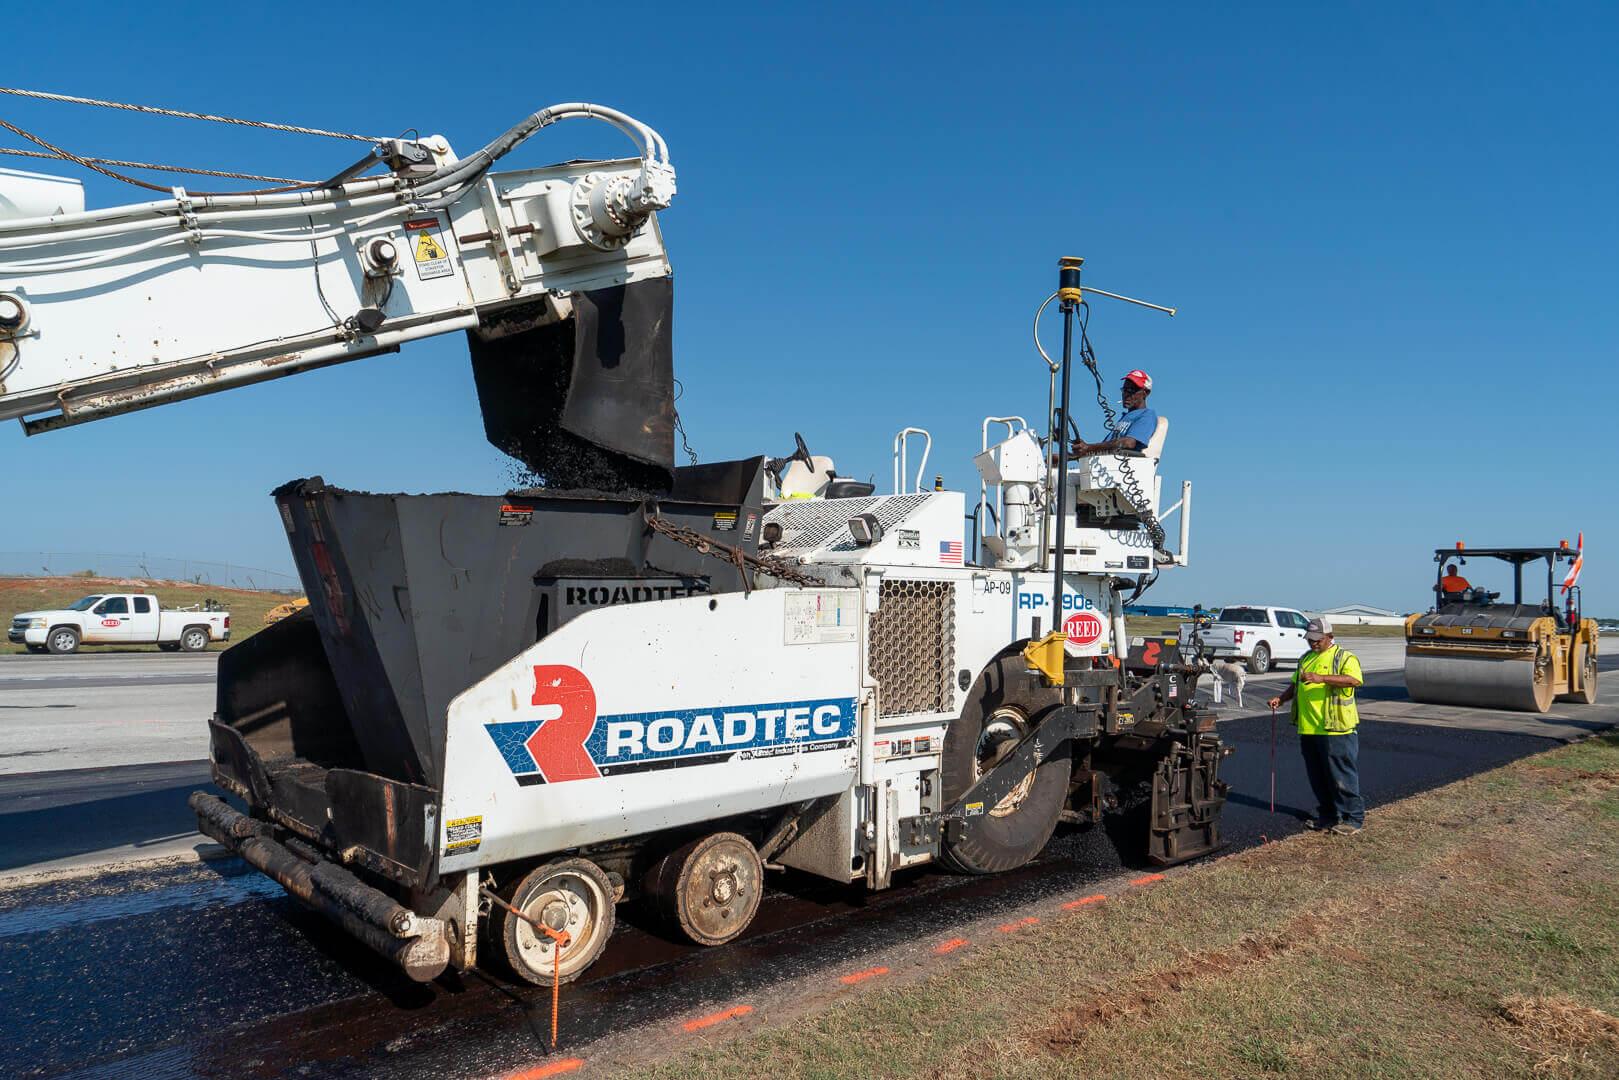 Roadtec RP-190 Highway Class Asphalt Paver